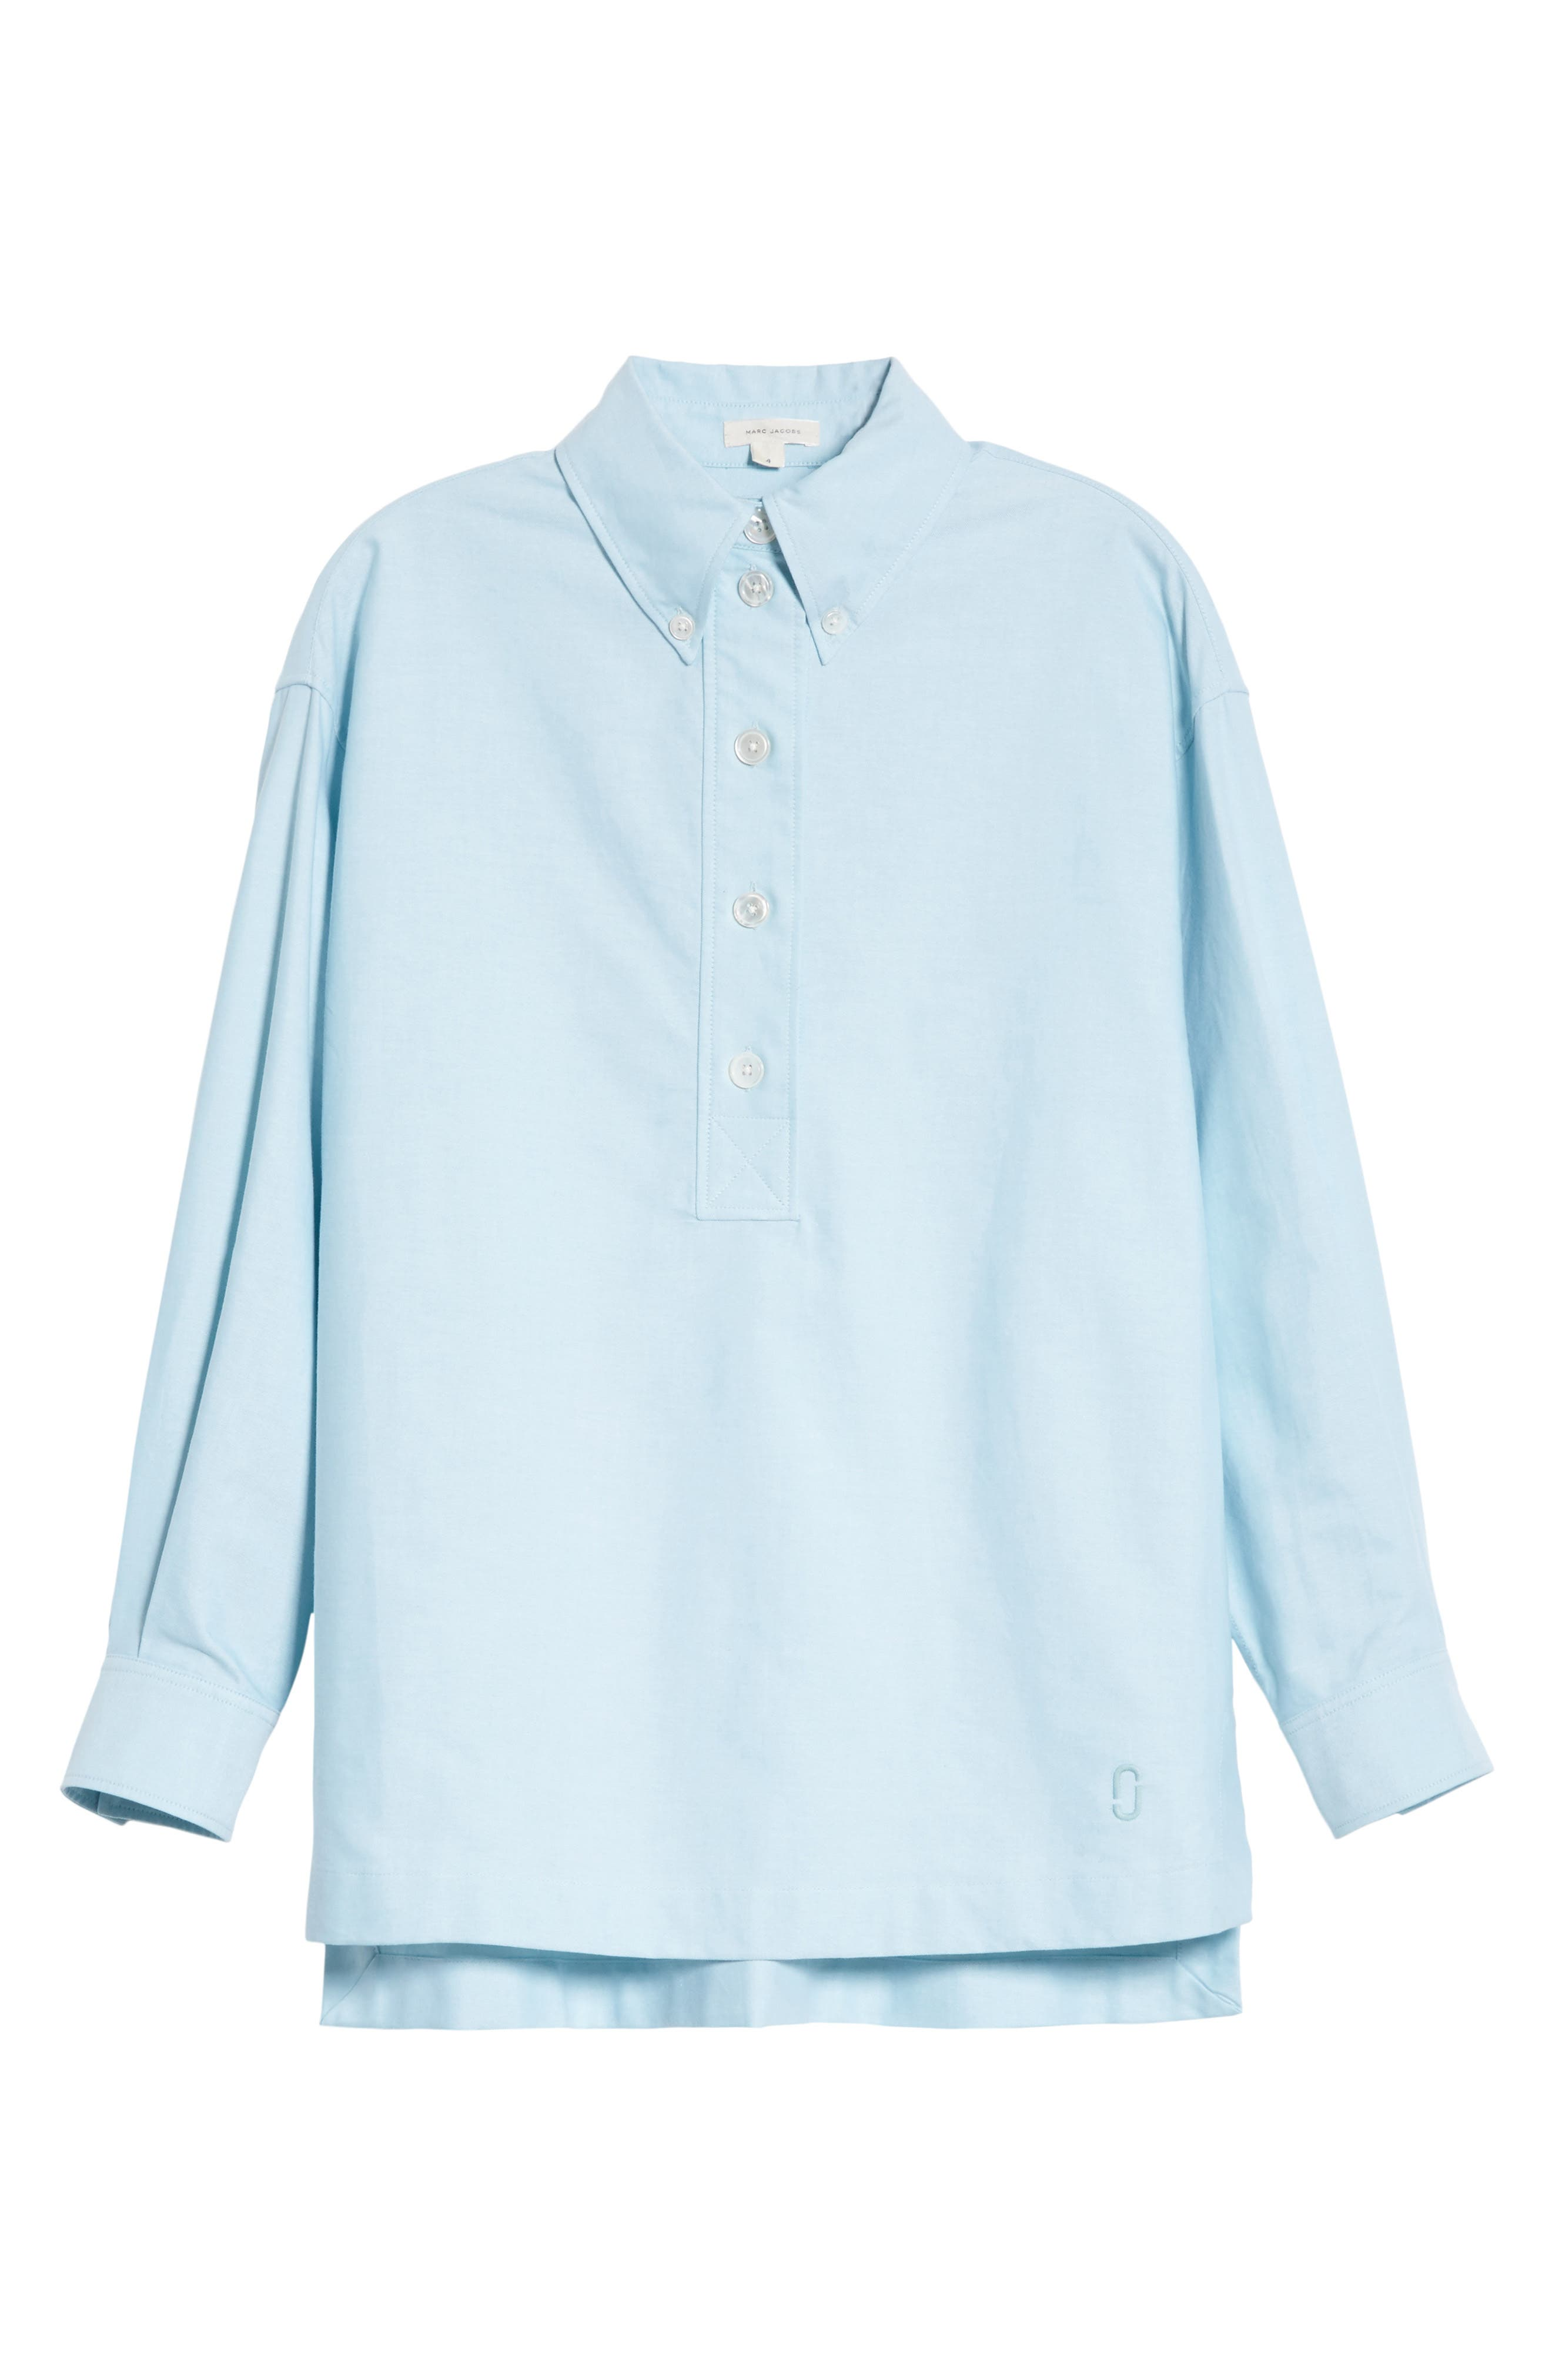 Oversize Half Placket Shirt,                             Alternate thumbnail 6, color,                             440